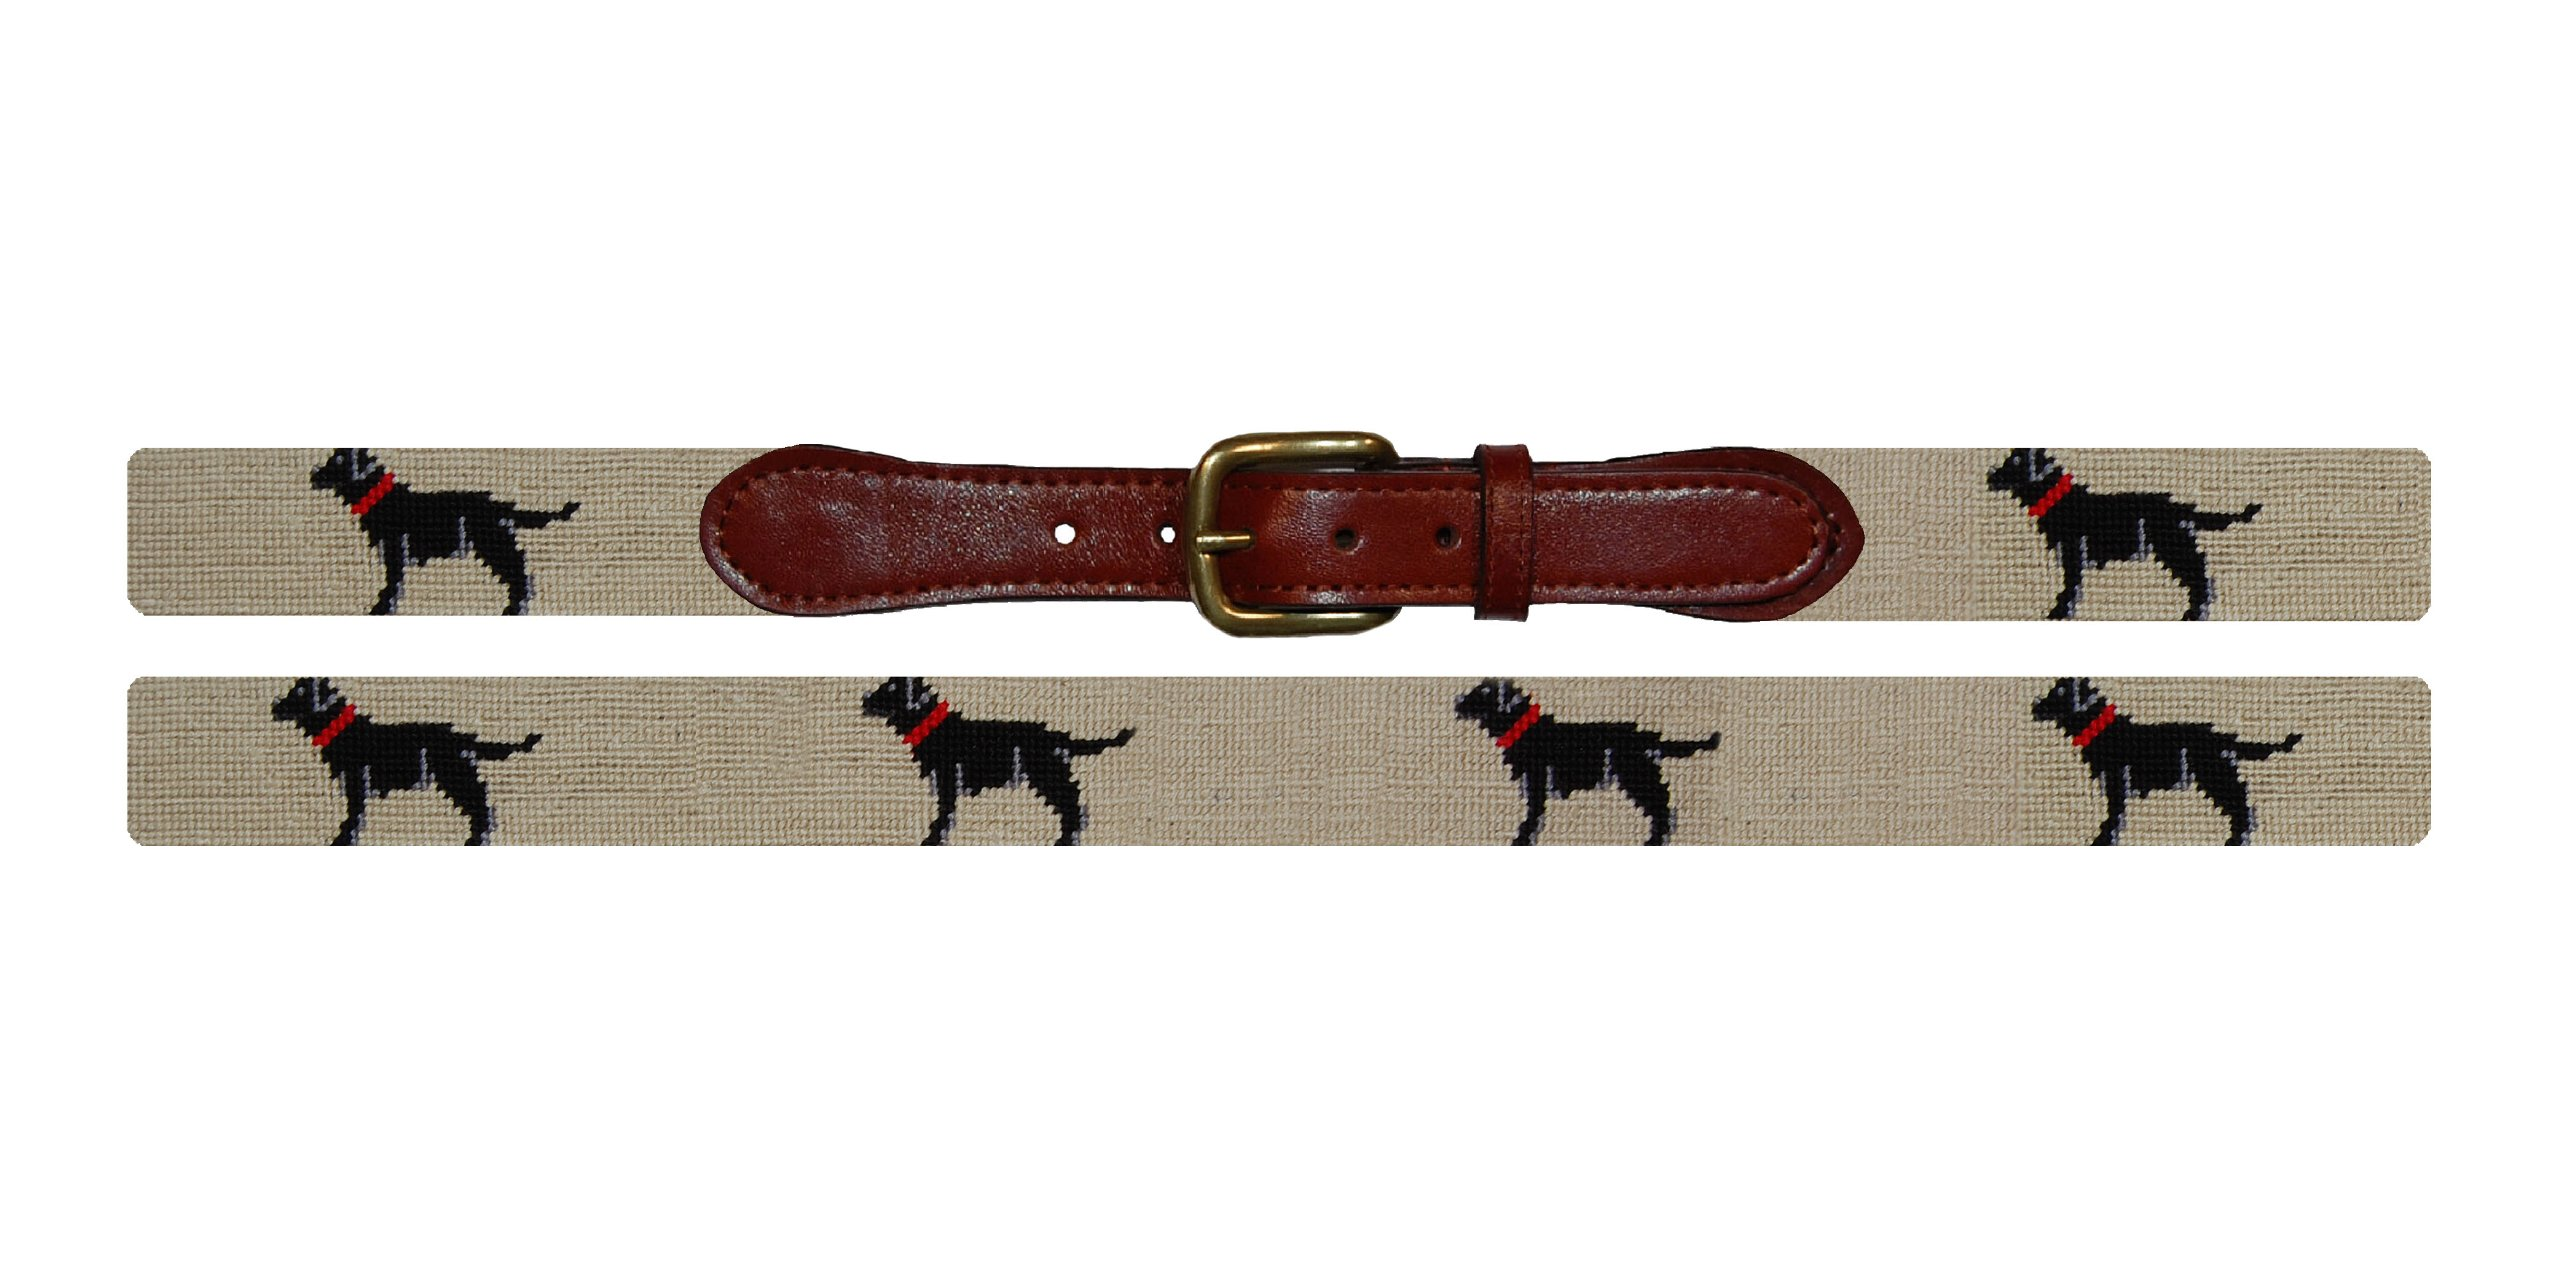 Smathers & Branson Black Lab Needlepoint Belt - Khaki, Size 42 (B-180-42)